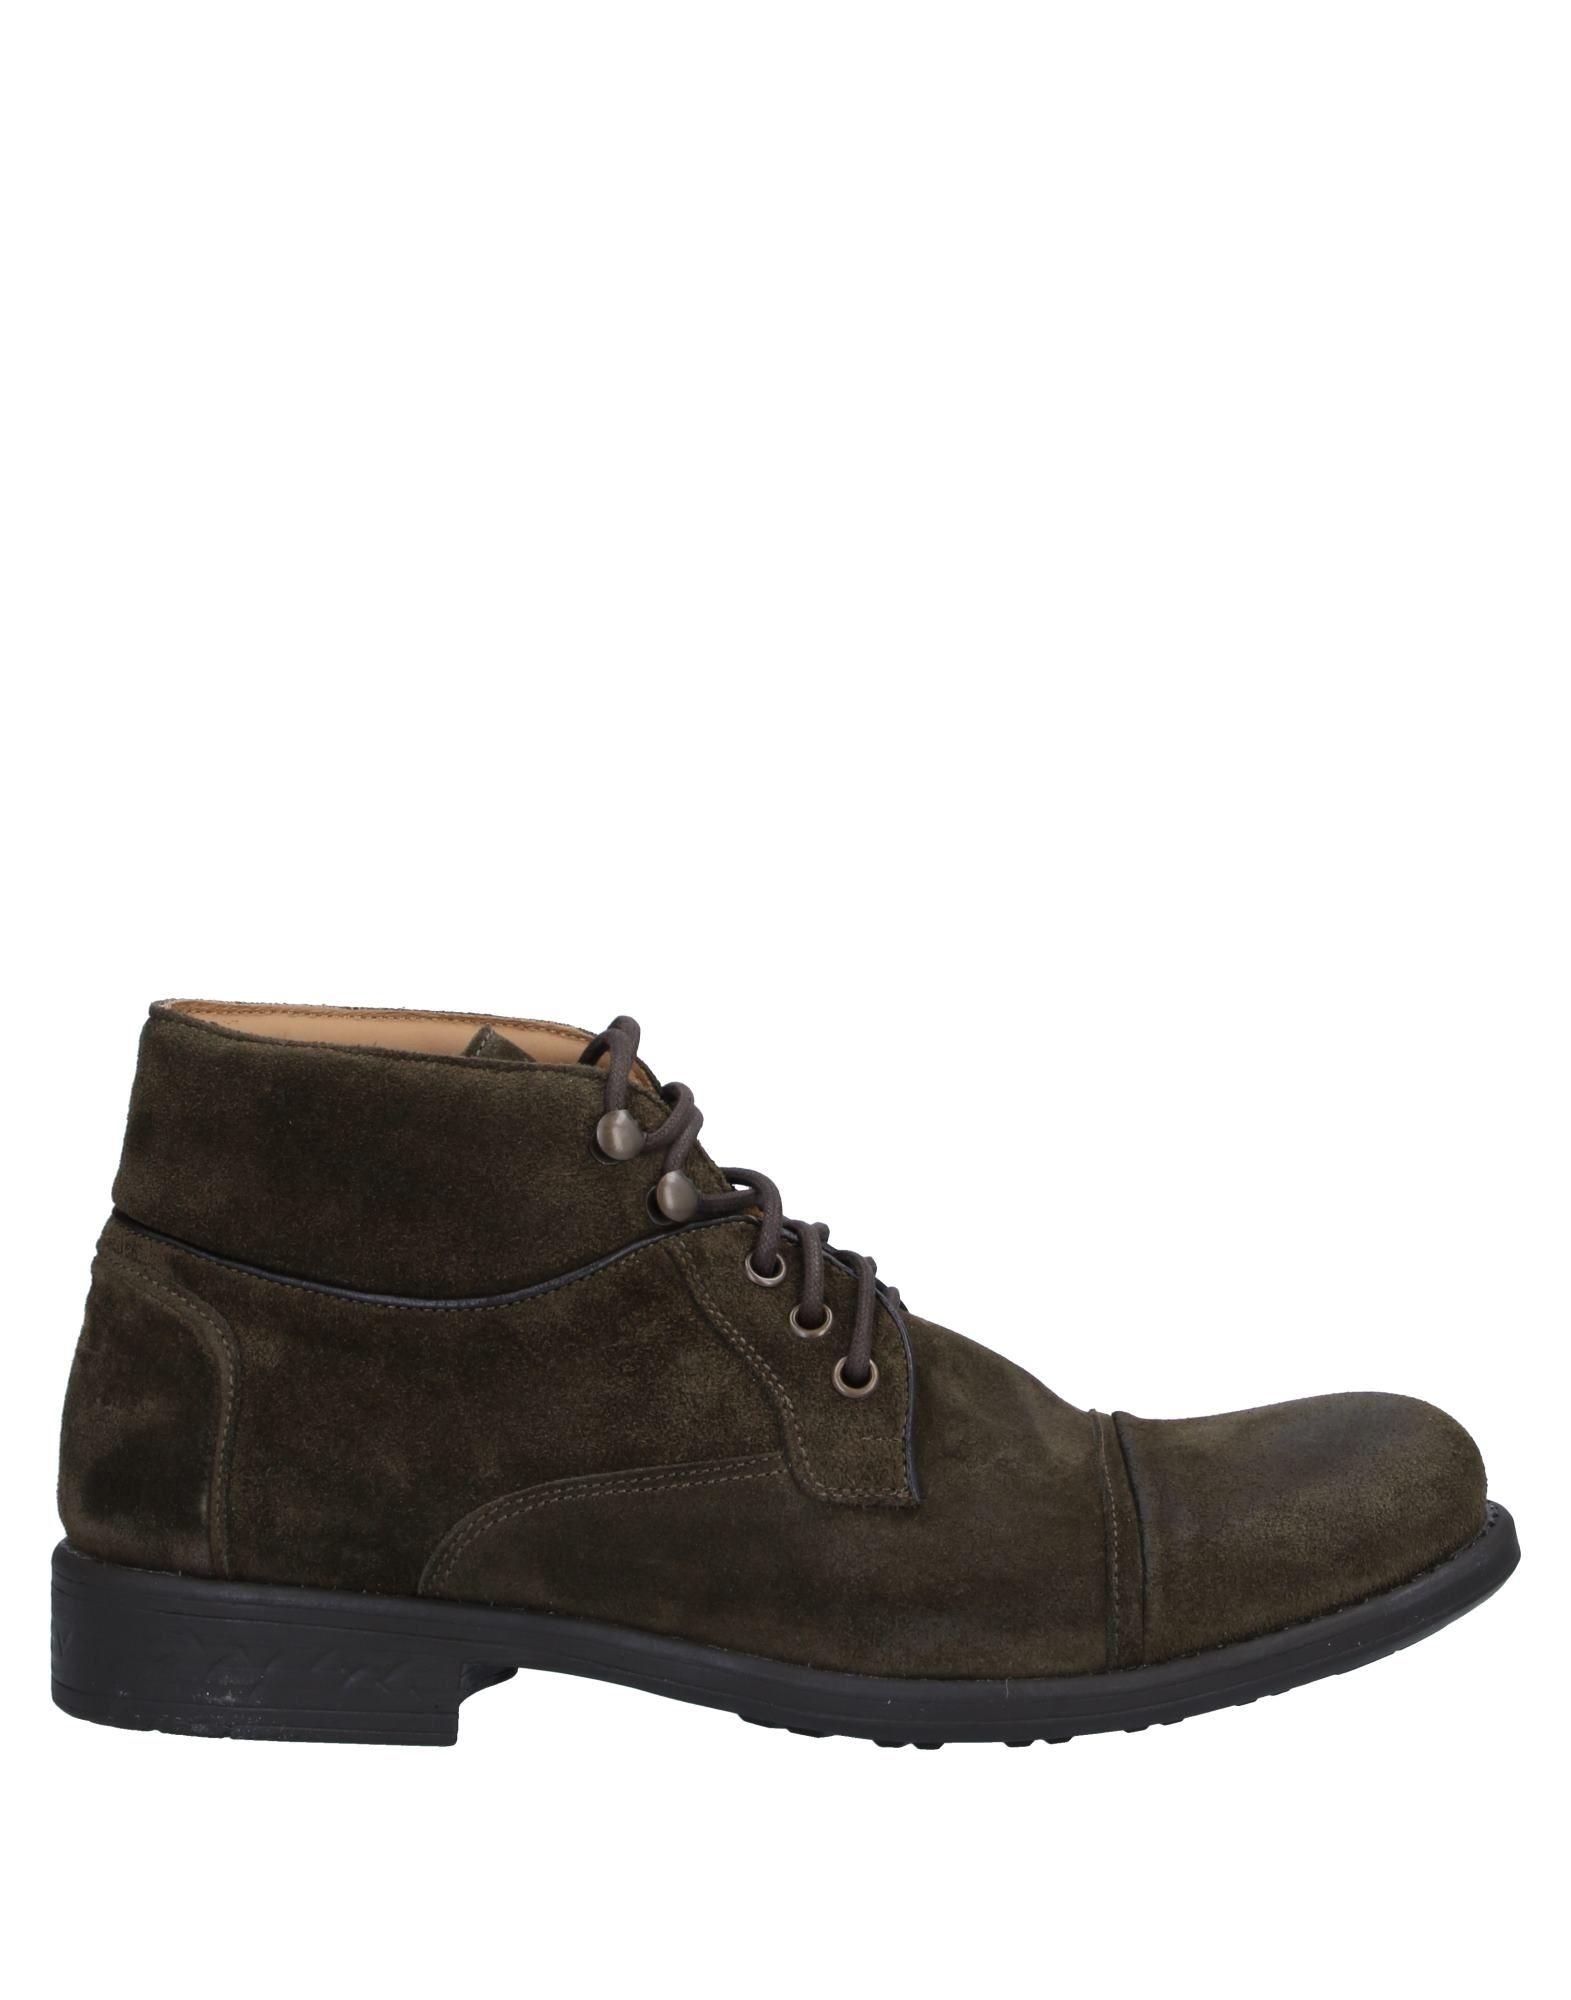 BRUNO BONELLI Полусапоги и высокие ботинки bruno magli полусапоги и высокие ботинки